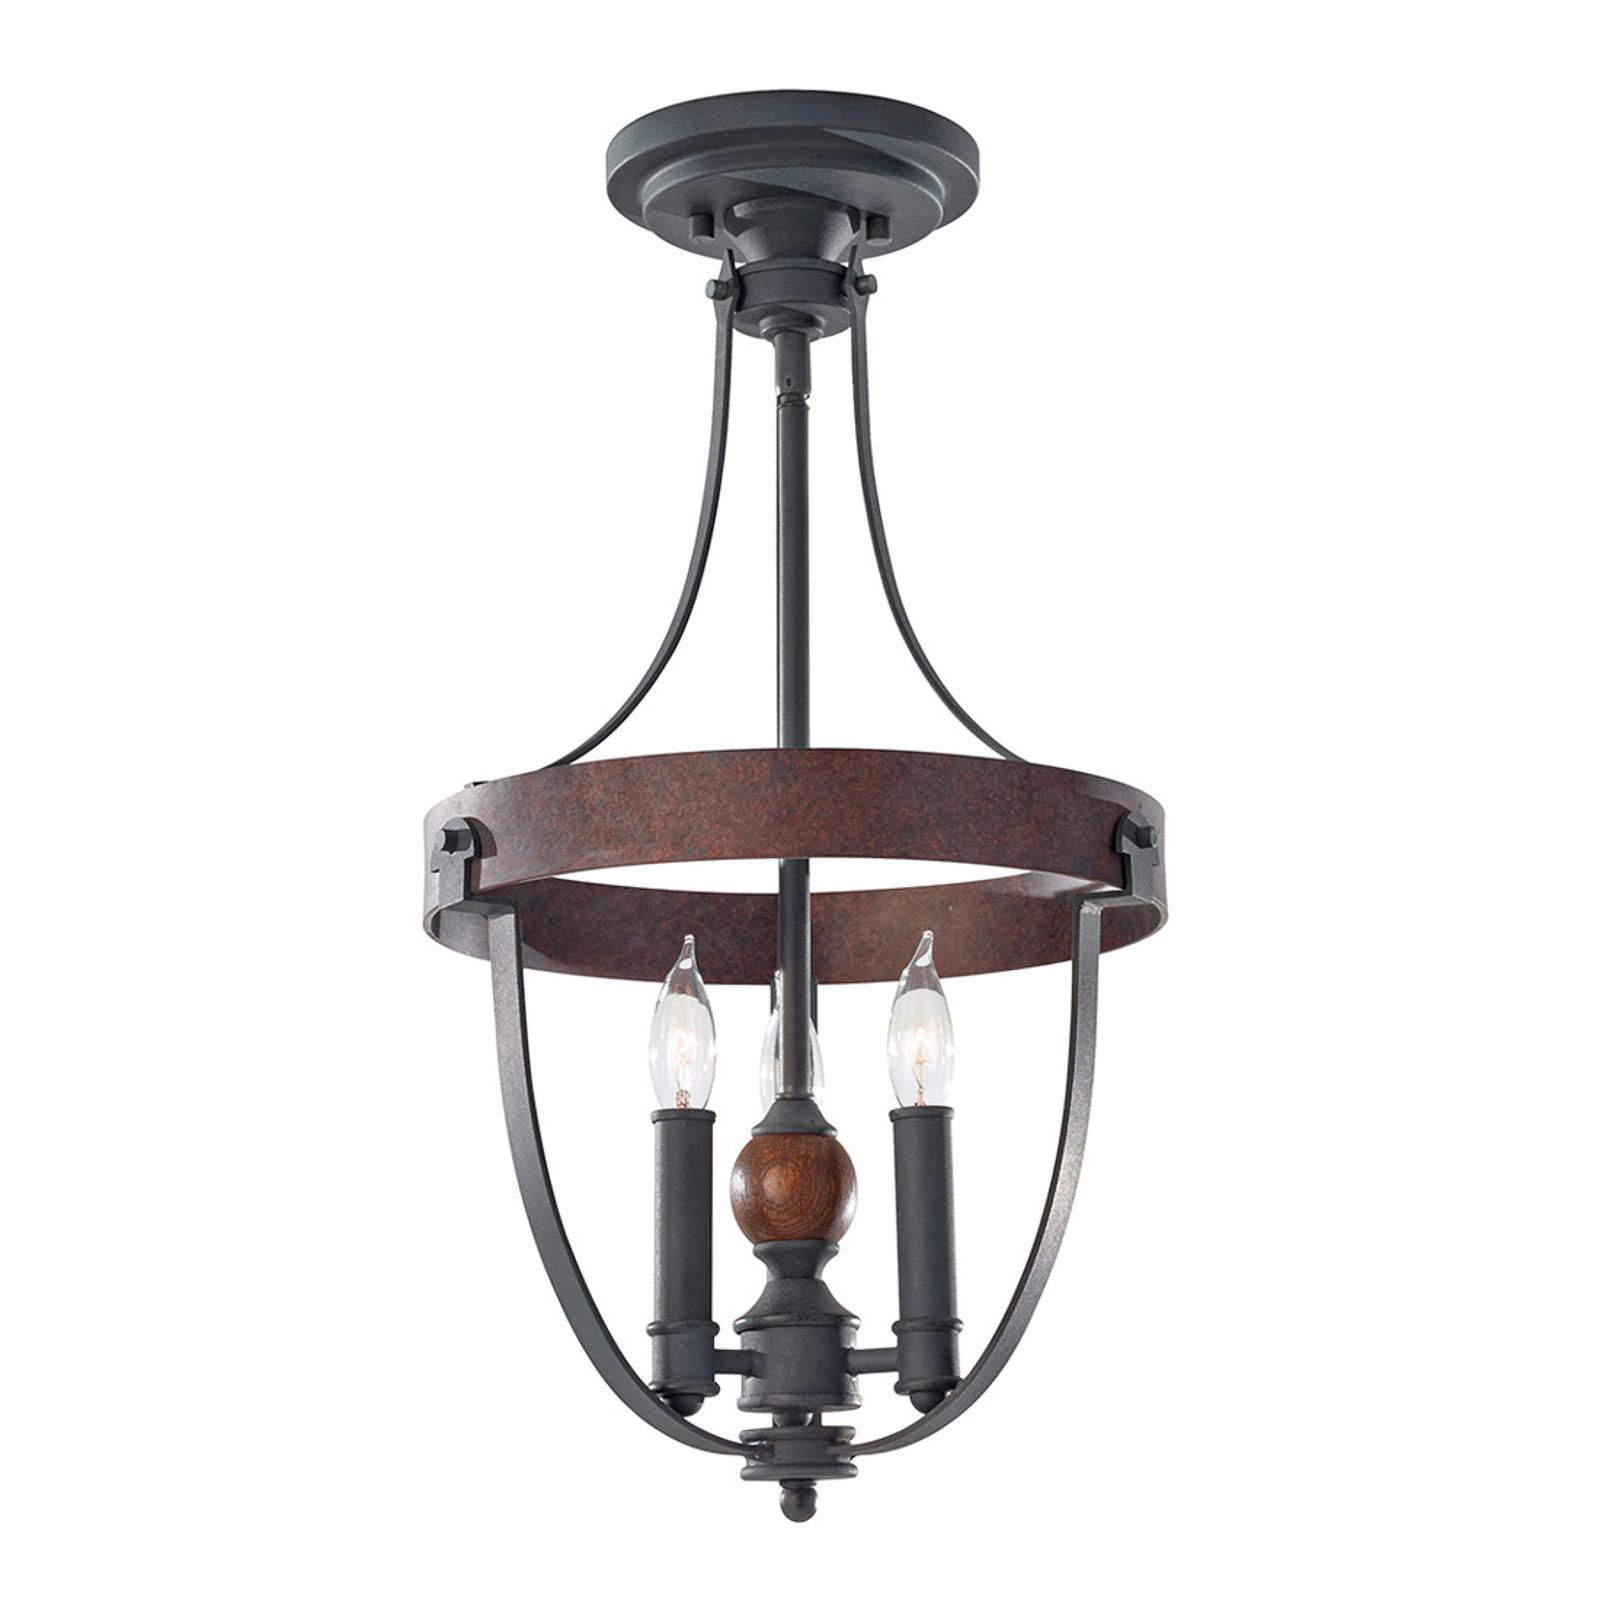 Country-stijl-plafondlamp Alston